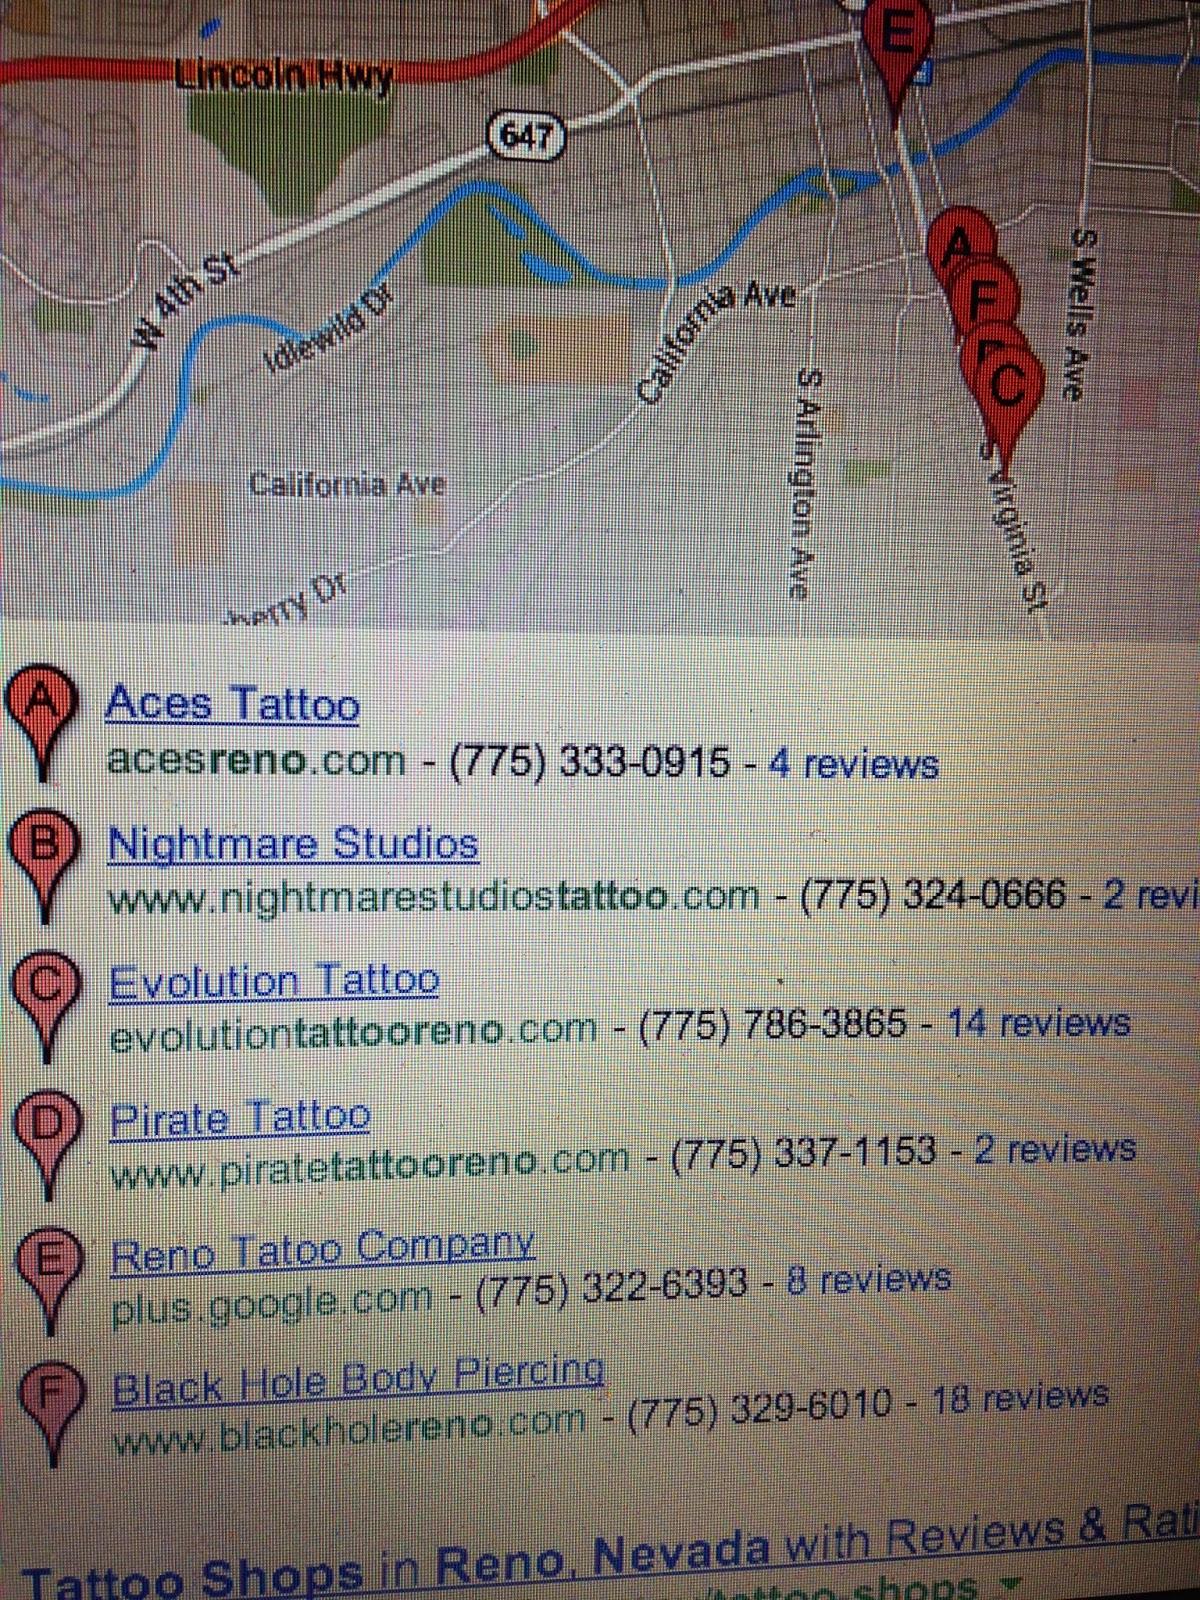 Reno Tattoo: Reno Tattoo Mecca